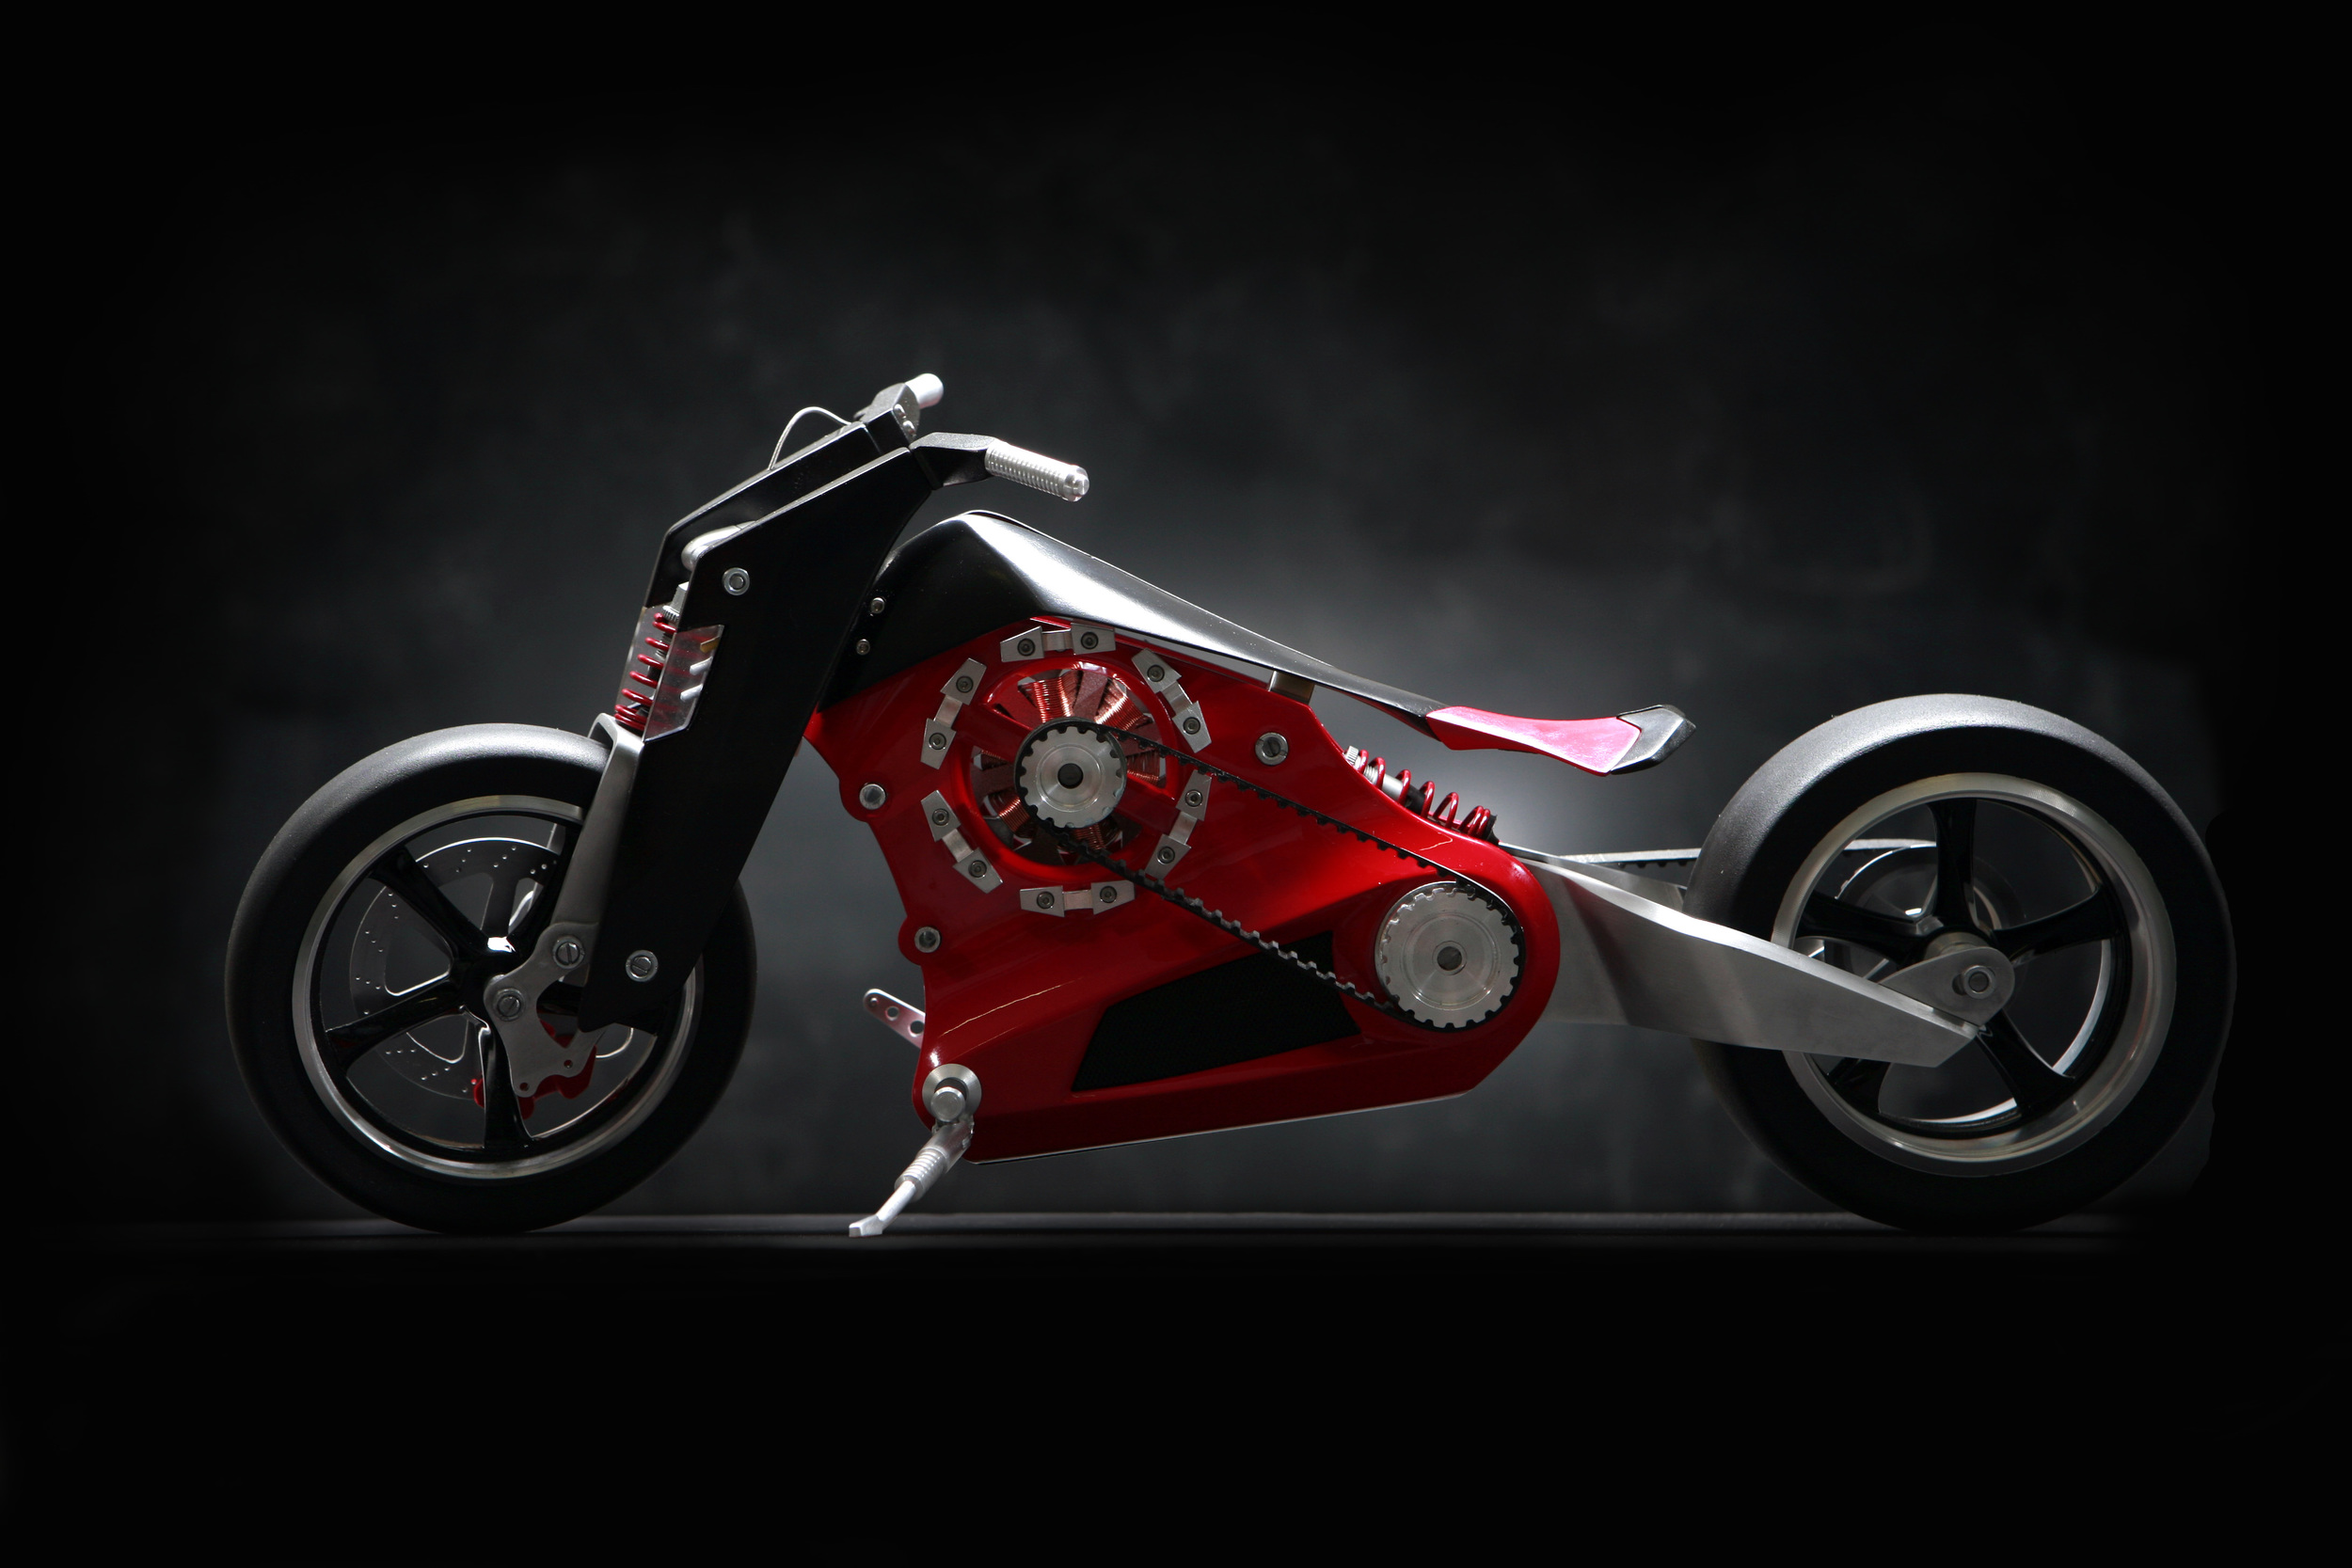 BernhardRanner_electric_rider_ZEVS_038_highres.jpg